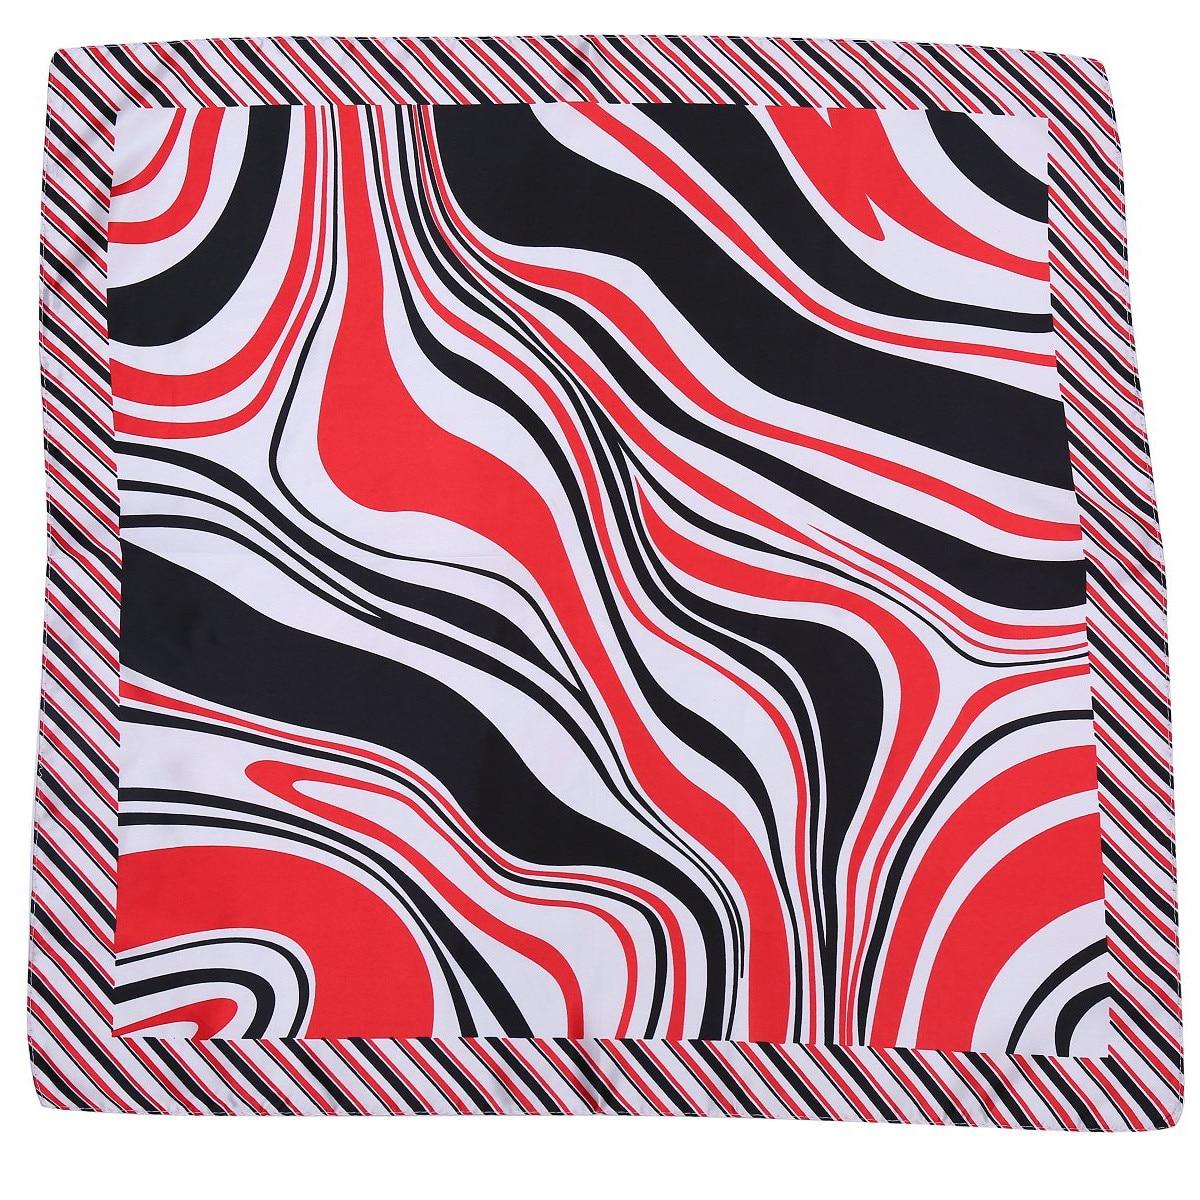 2017 New Bag Scarf Satin Silk Zebra Print Handkerchief Scarves Shawl Hijab Square Scarves OL Wome Necklace Wrap Handbag Bufandas